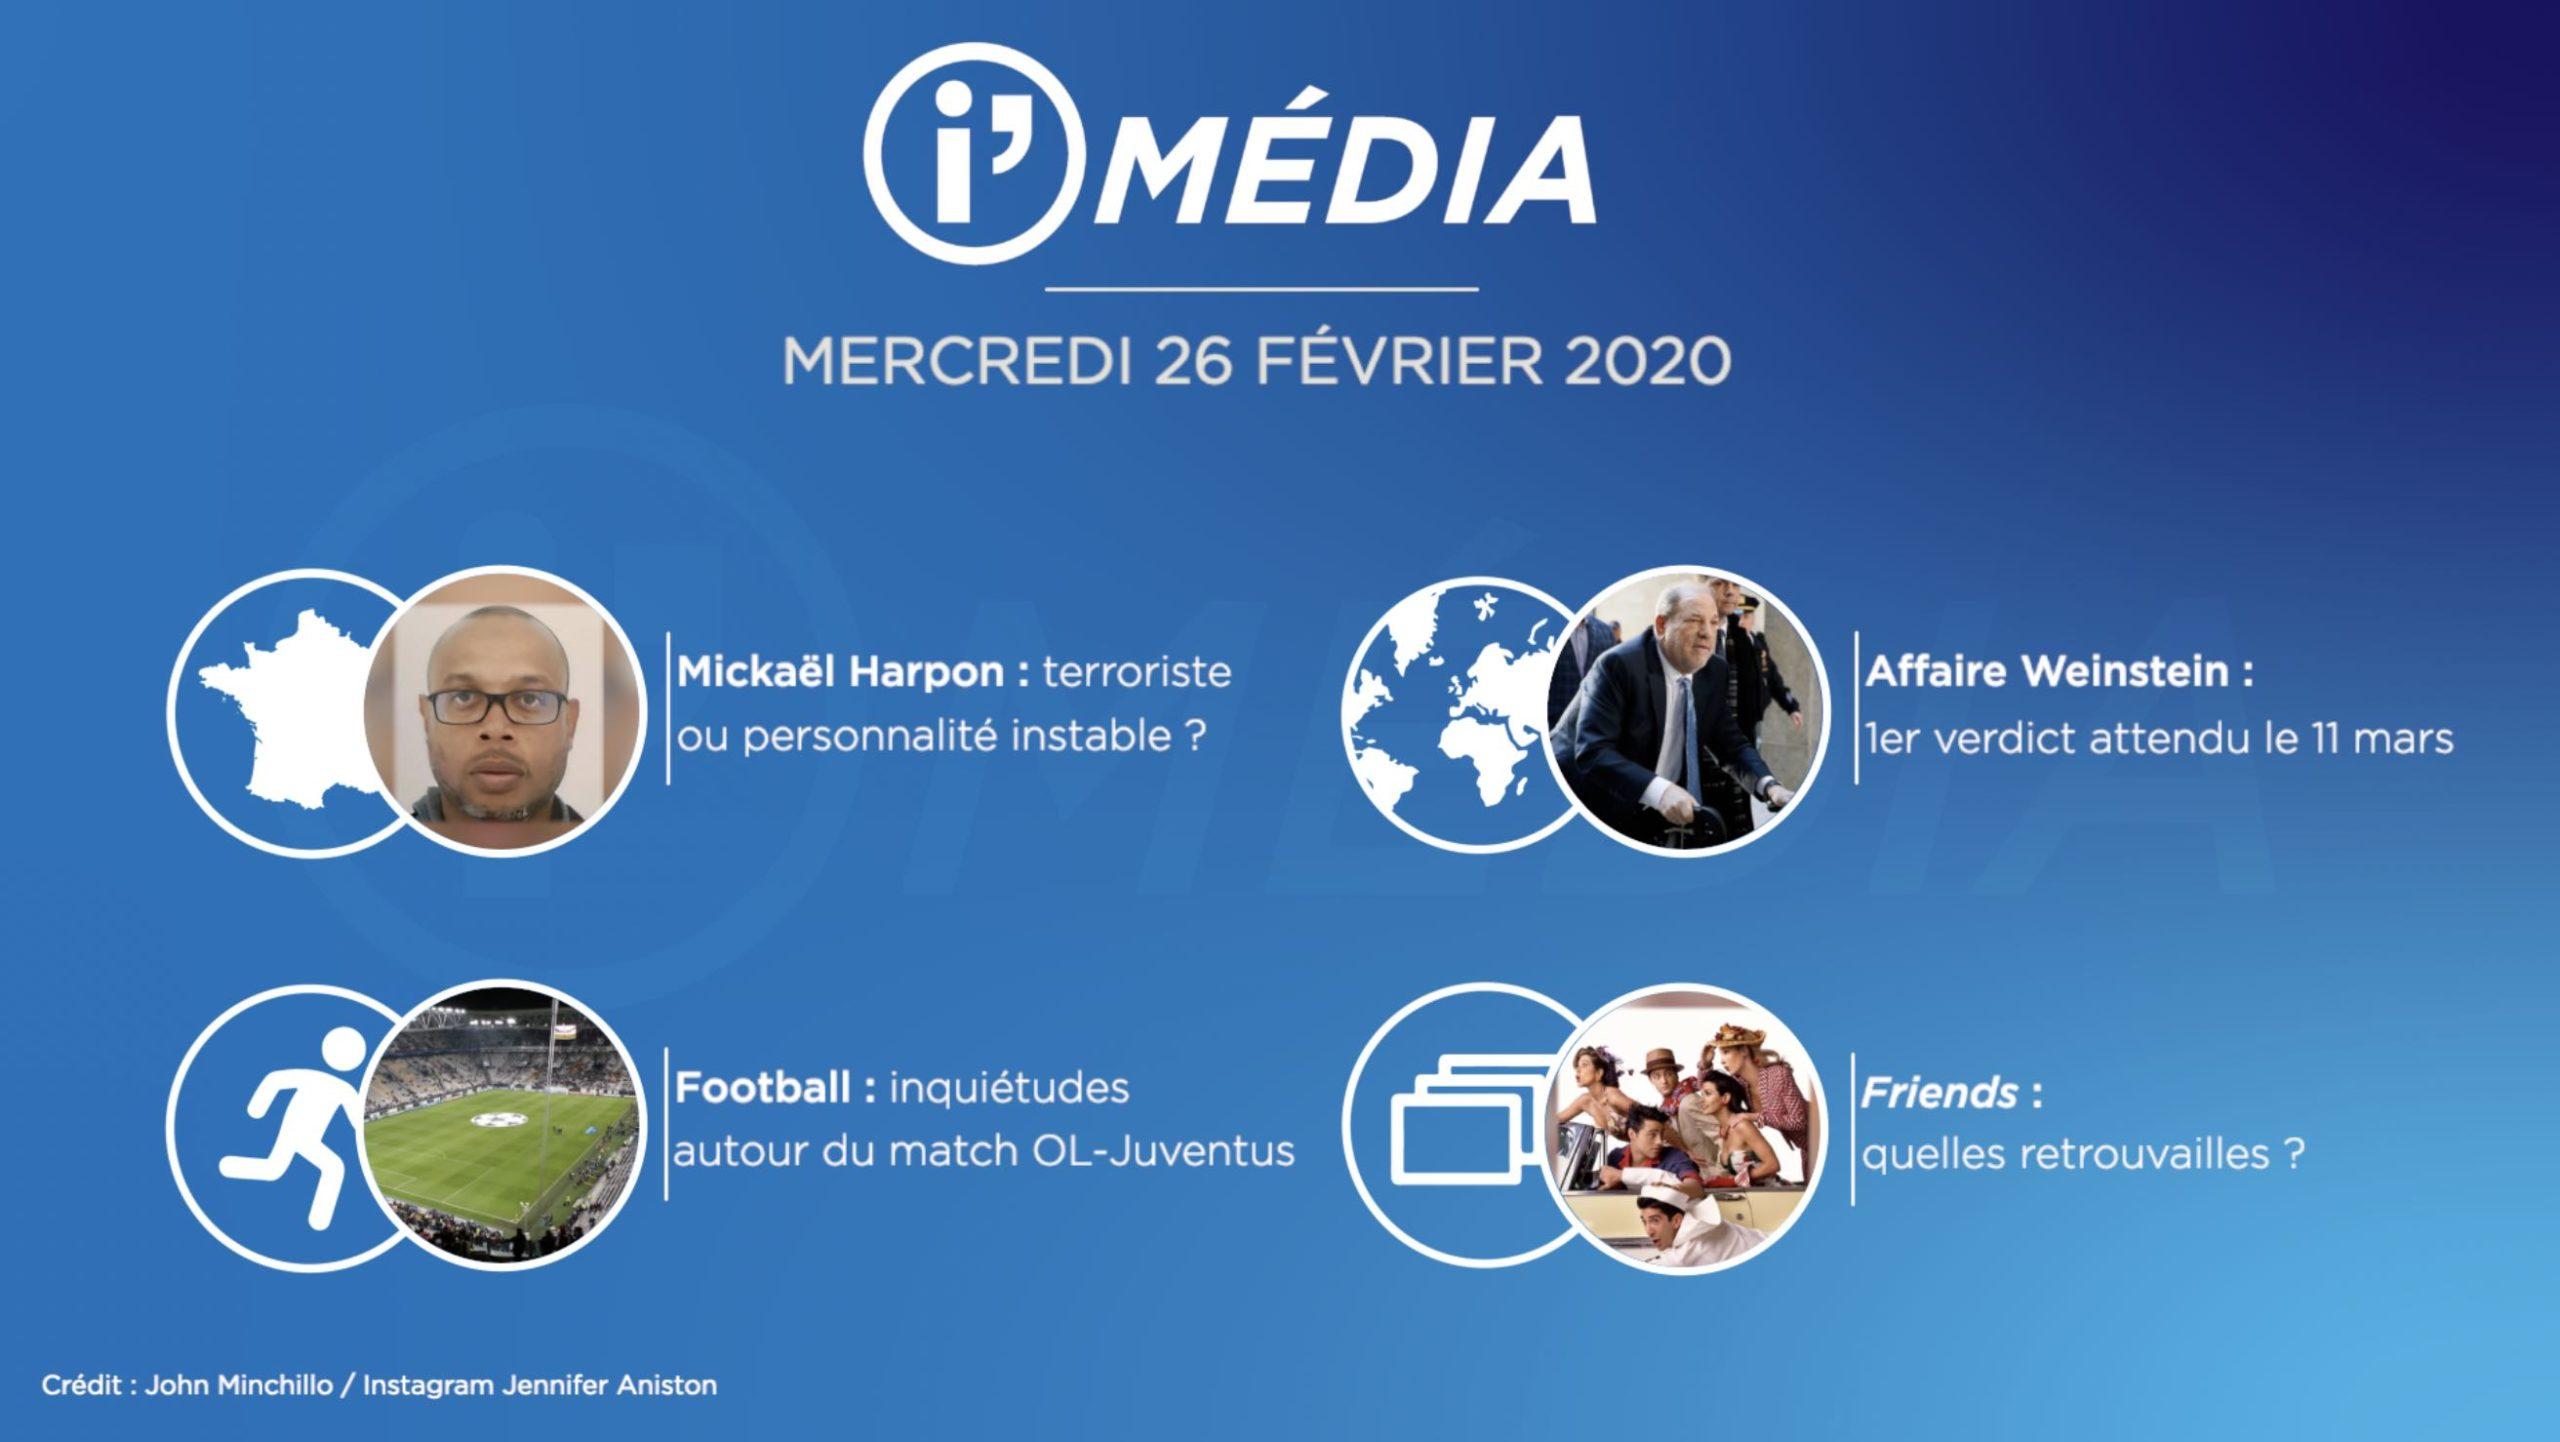 Capture_i_Média_MERCREDI_26_fevrier_2020_V3